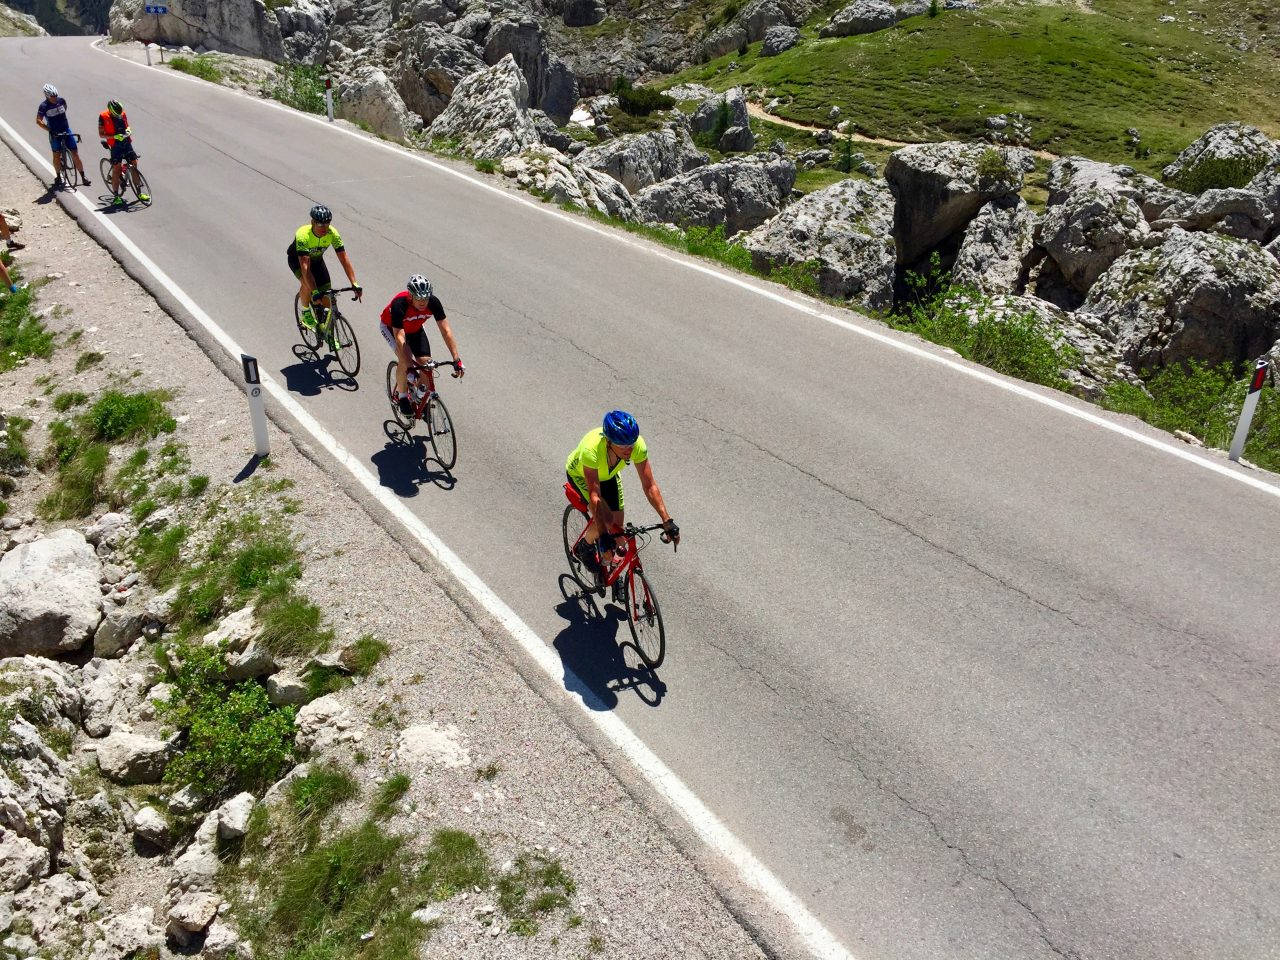 Hans-Jörg, Jürgen u. Andi, Passo Valparola, Dolomites, Italy